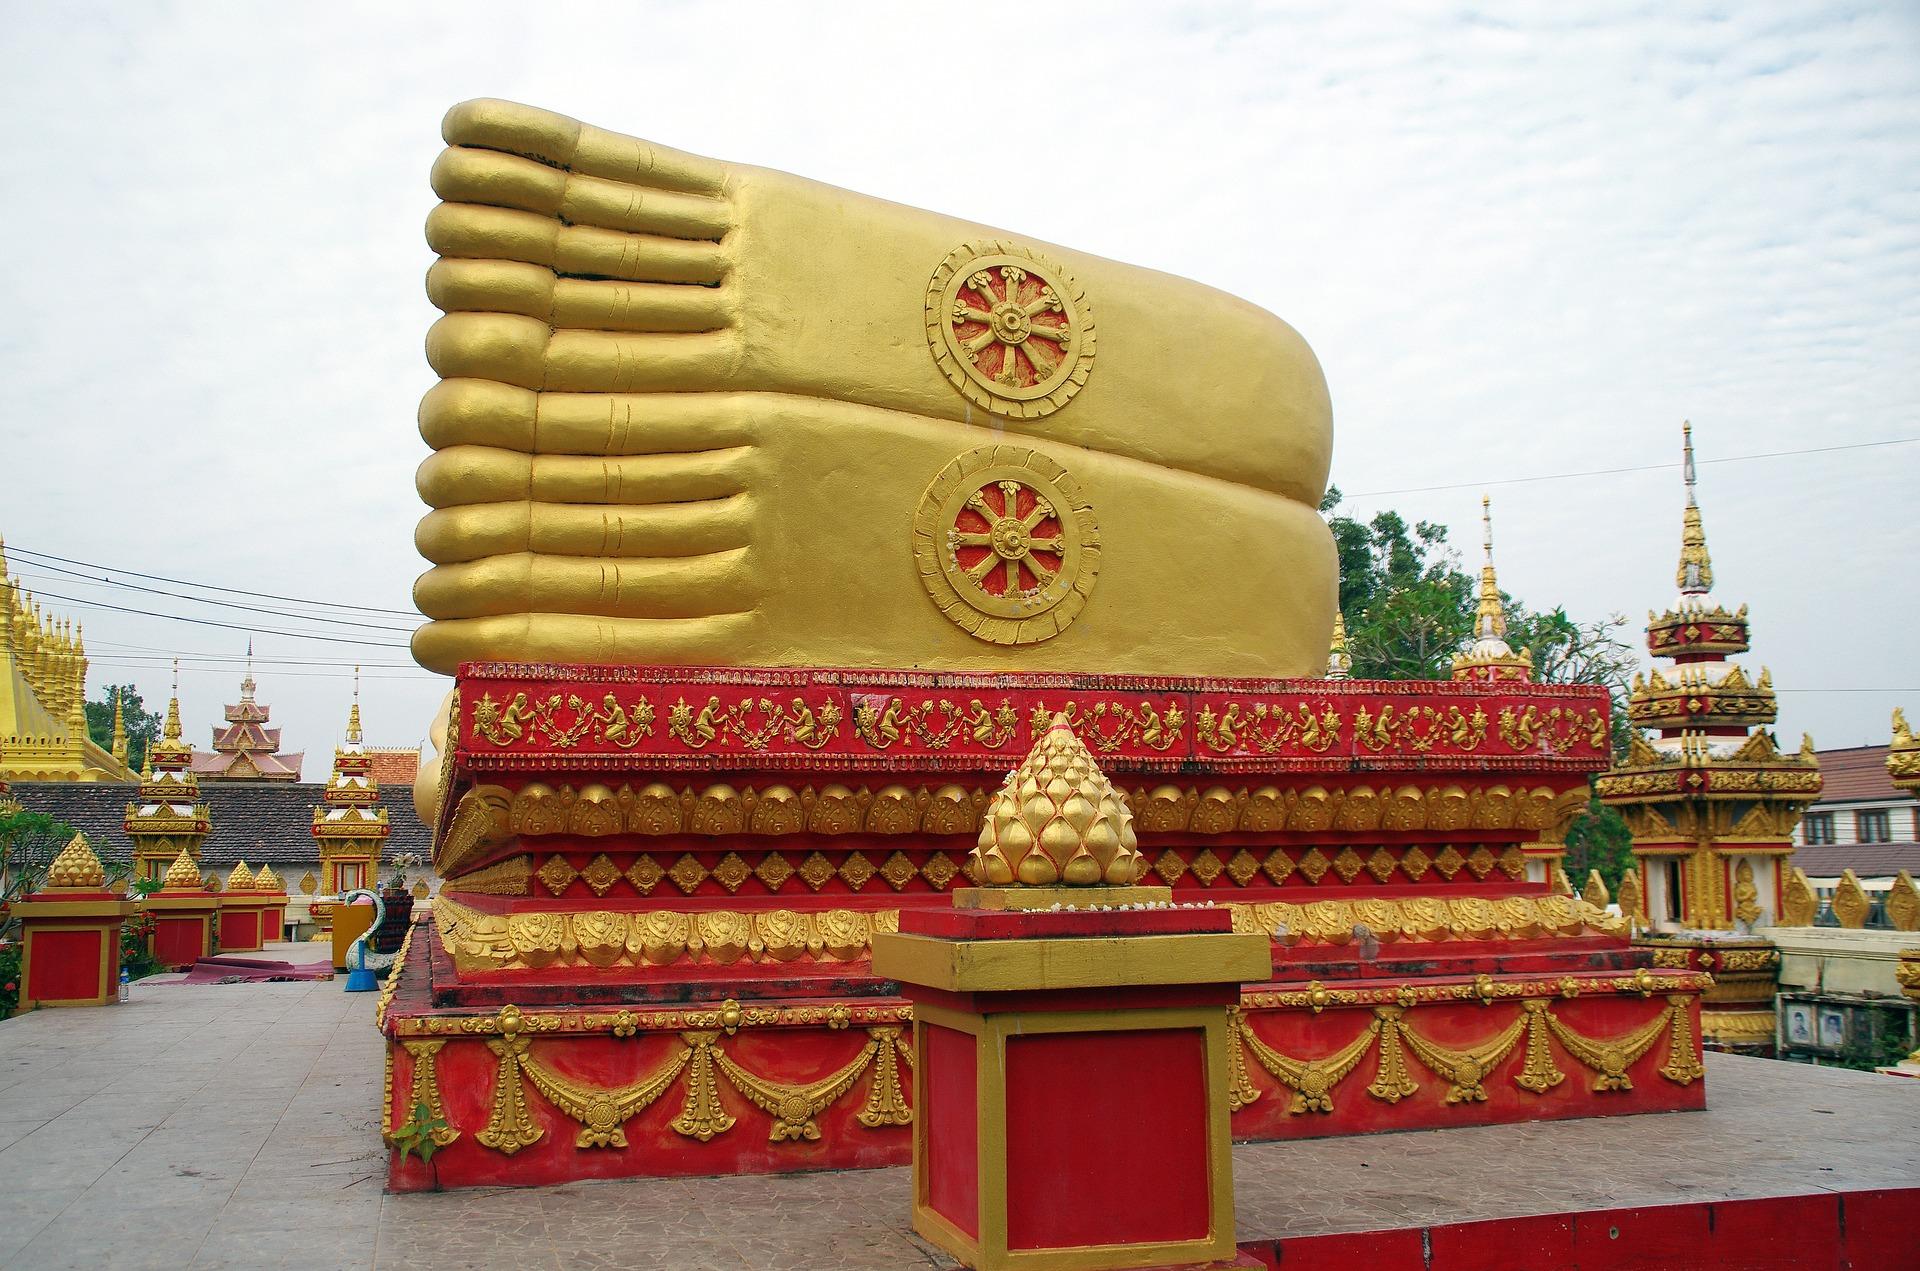 Buddha's feet